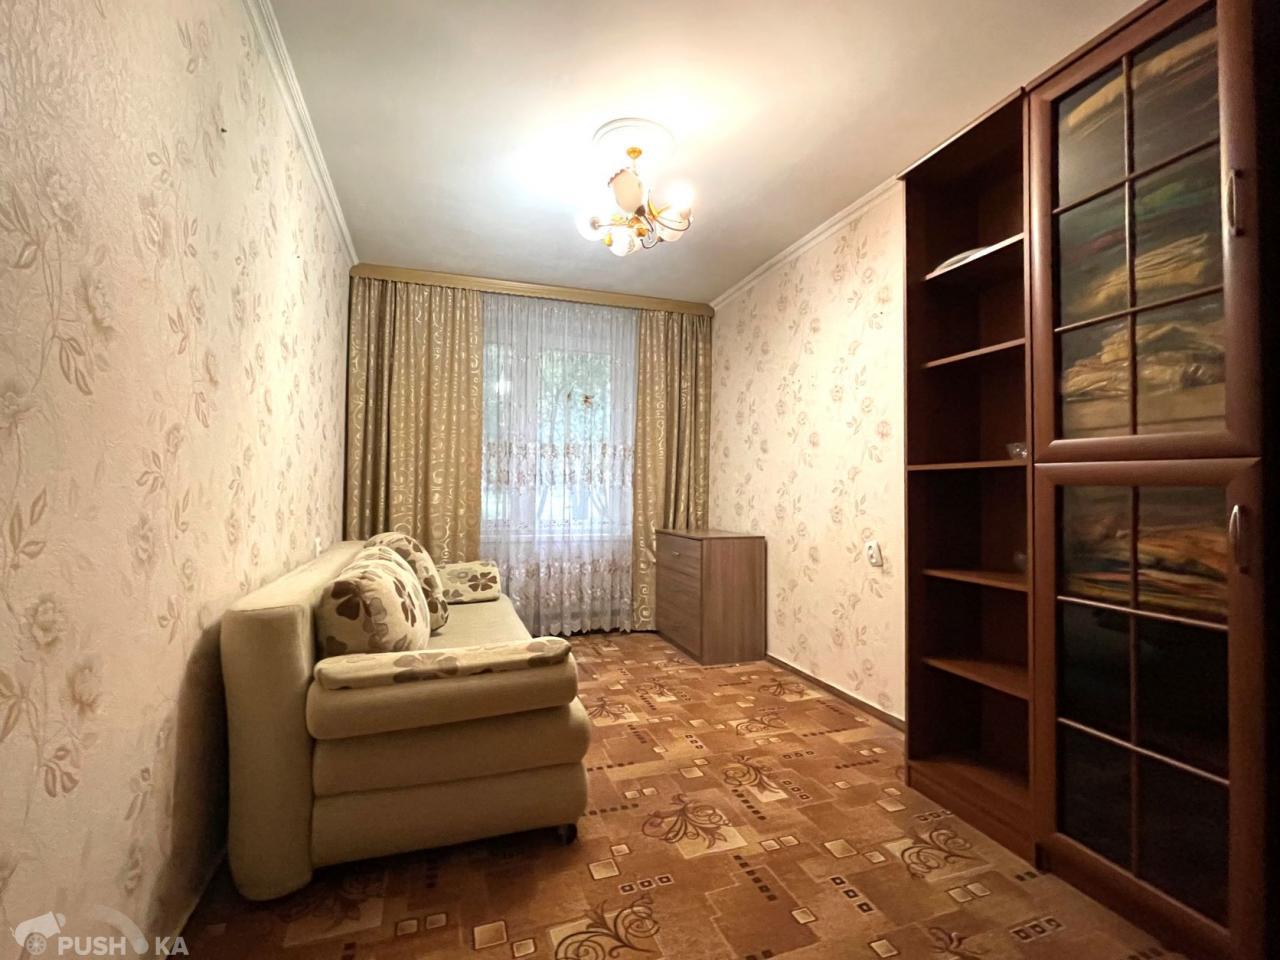 Продаётся 3-комнатная квартира 57.0 кв.м. этаж 1/9 за 10 950 000 руб